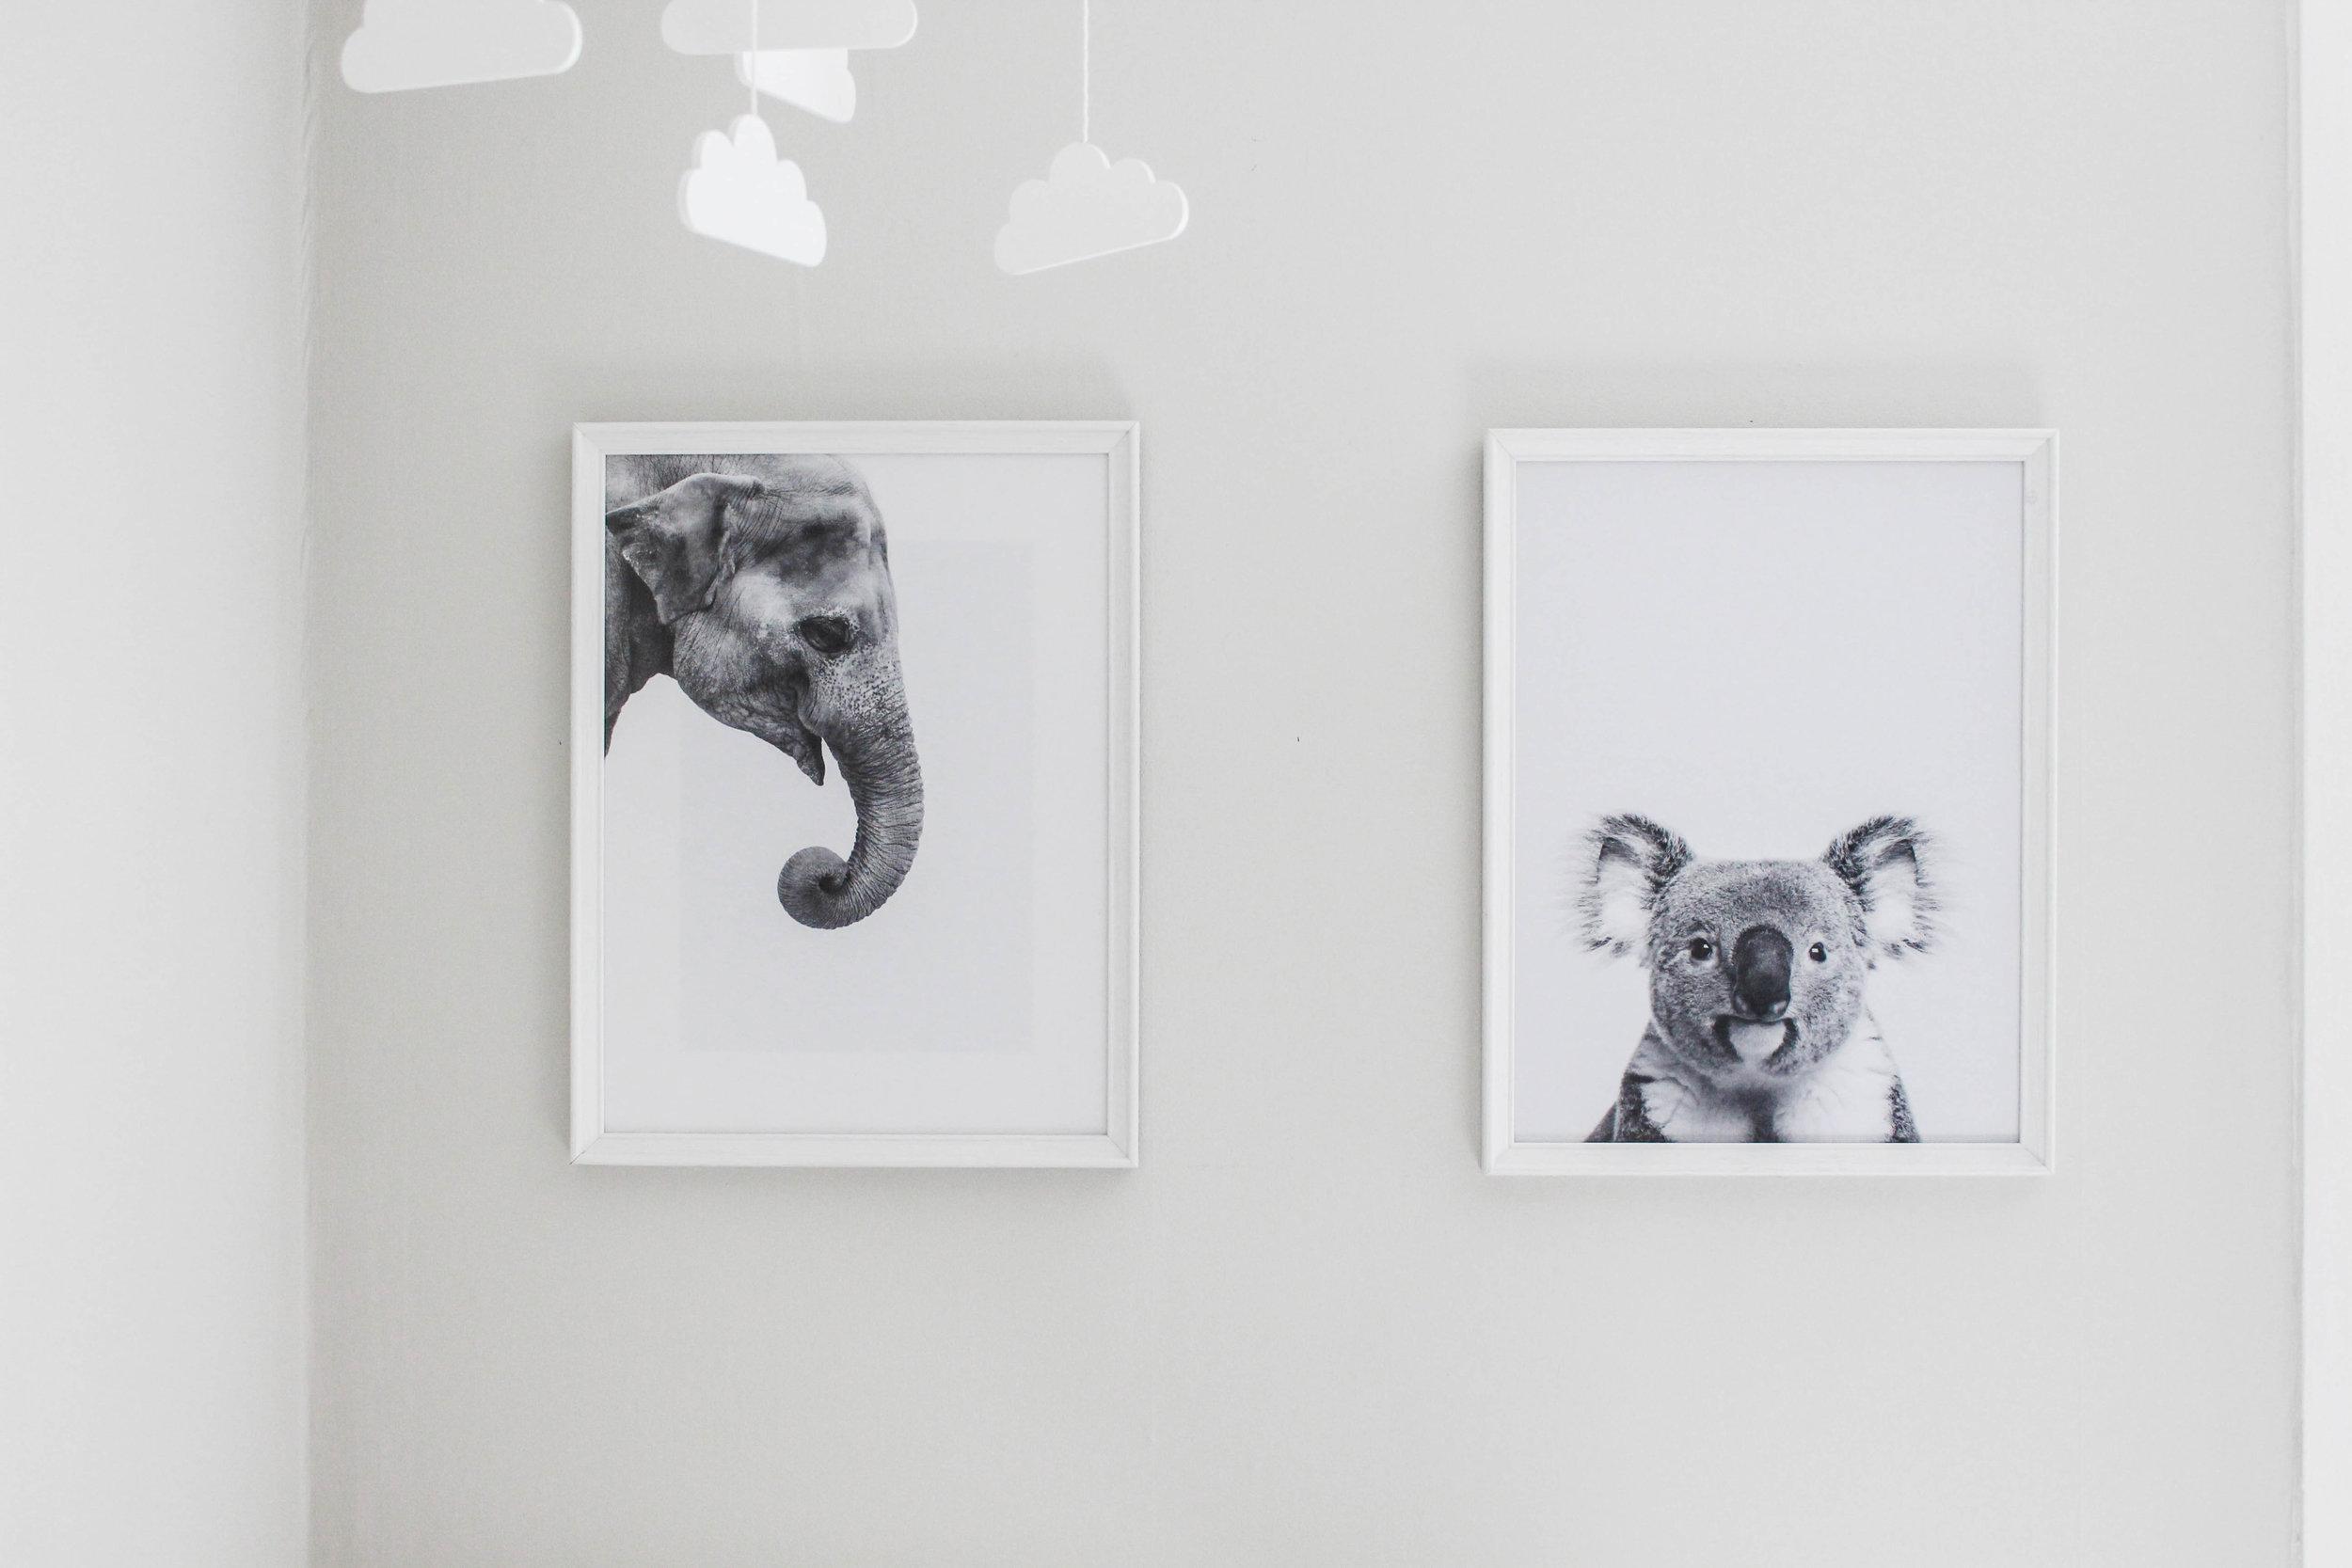 Cheap Scandinavian Nursery Posterlounge prints